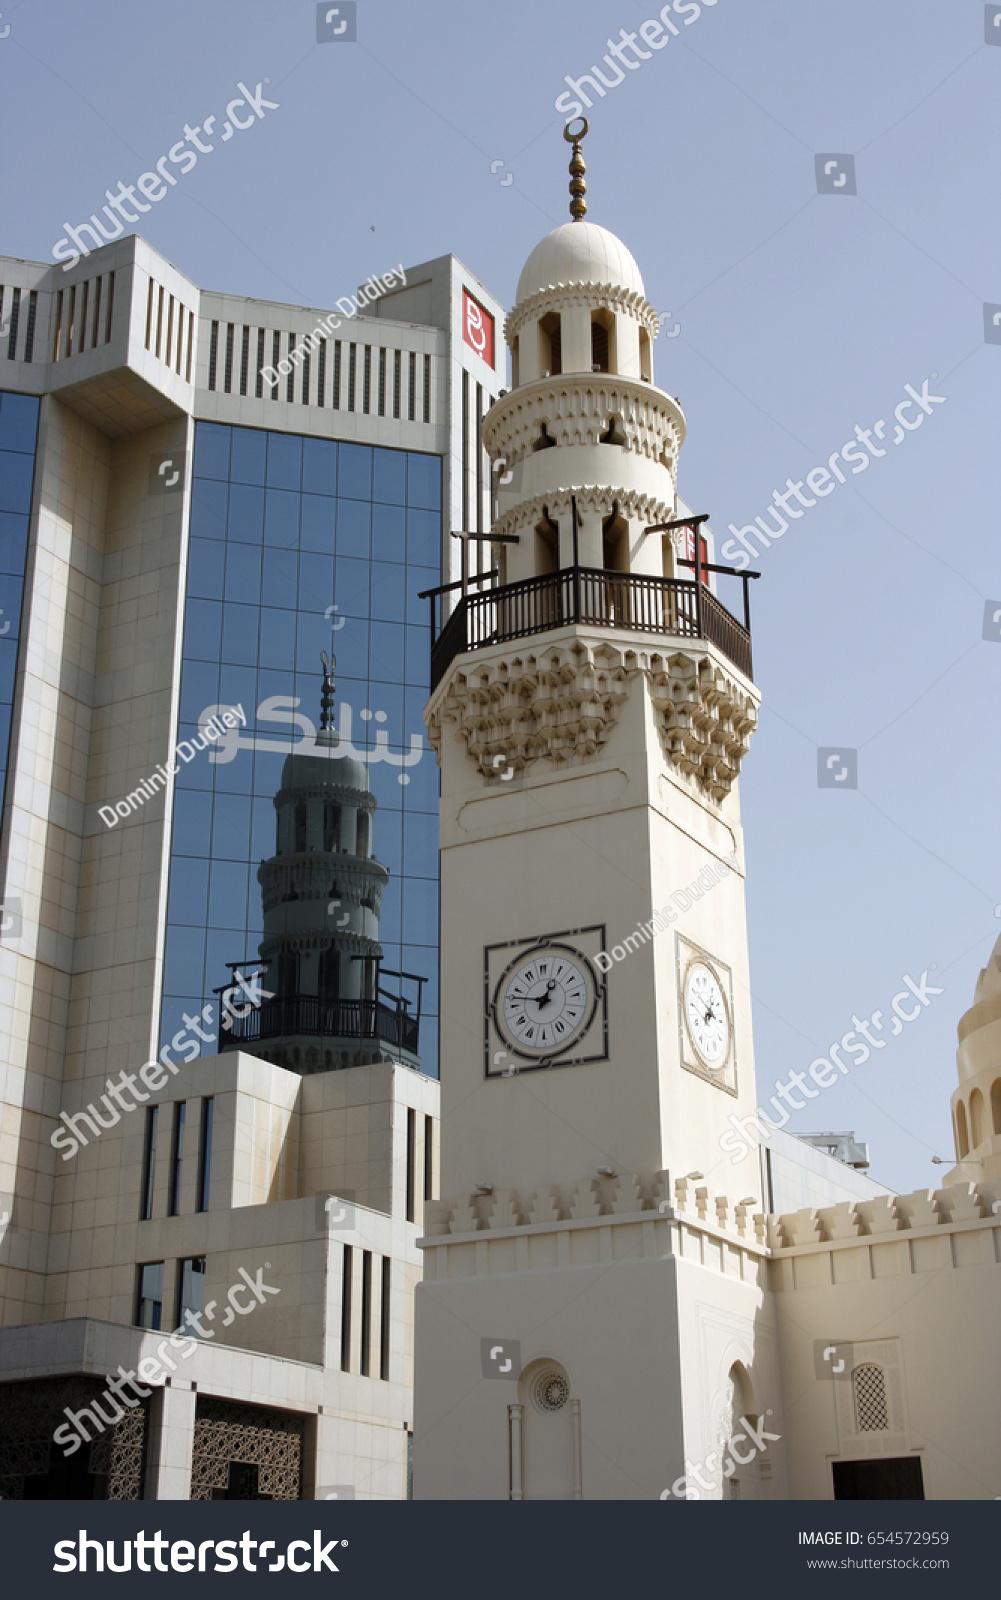 Minaret Batelco Offices Manama Bahrain On Stock Photo (Edit Now